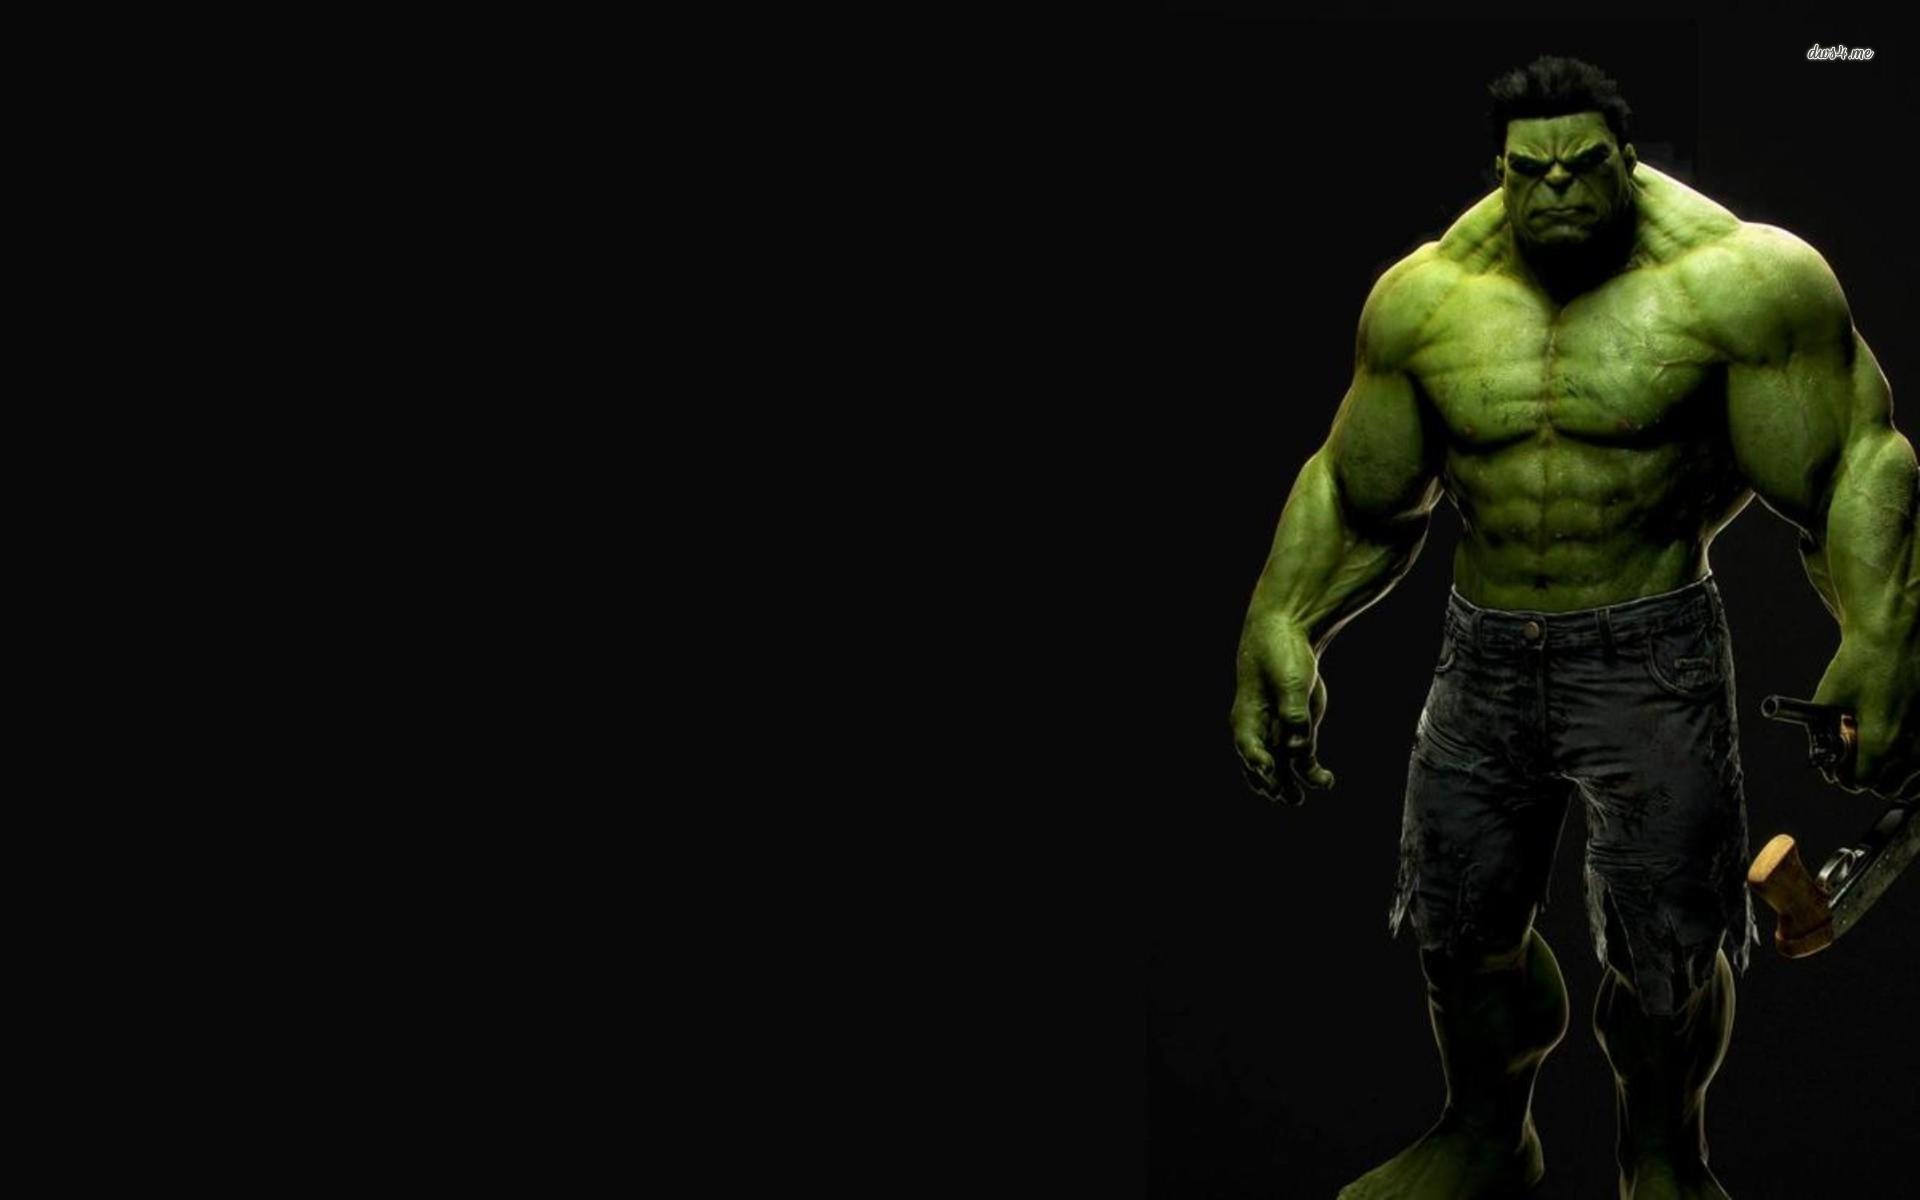 Hulk HD Wallpapers for desktop download 1920x1200